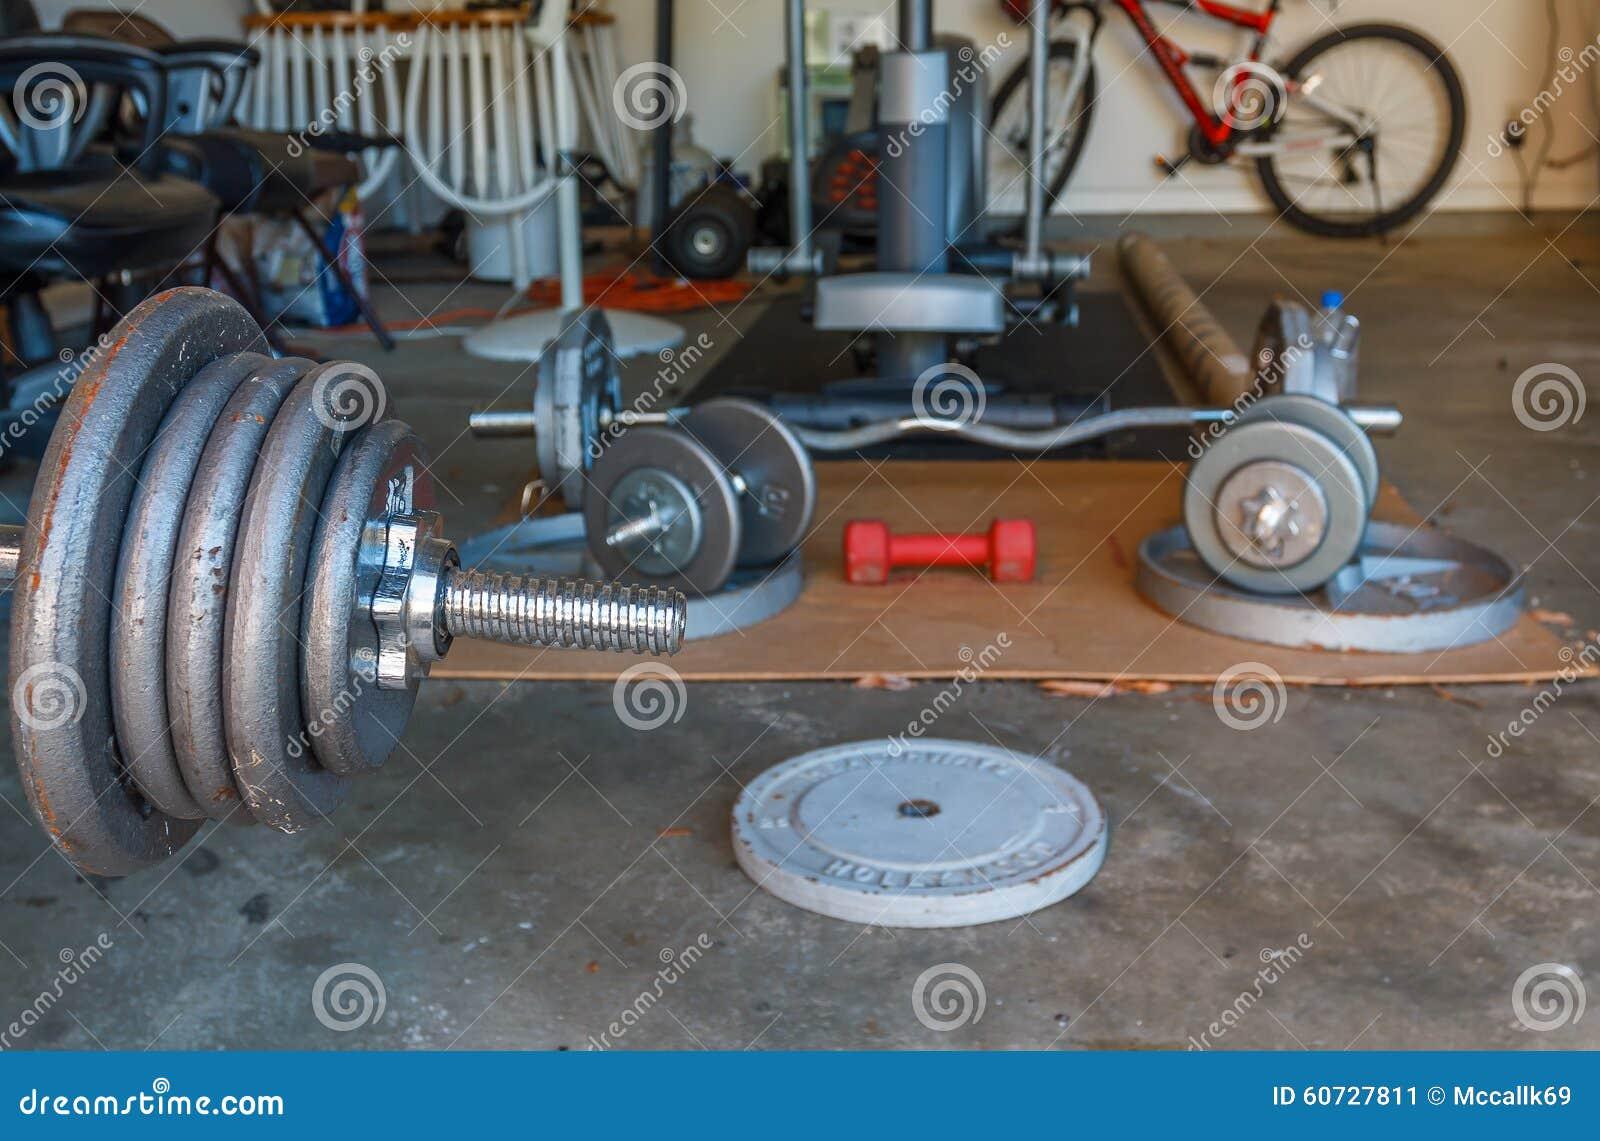 Home gym stock image image of station iron created